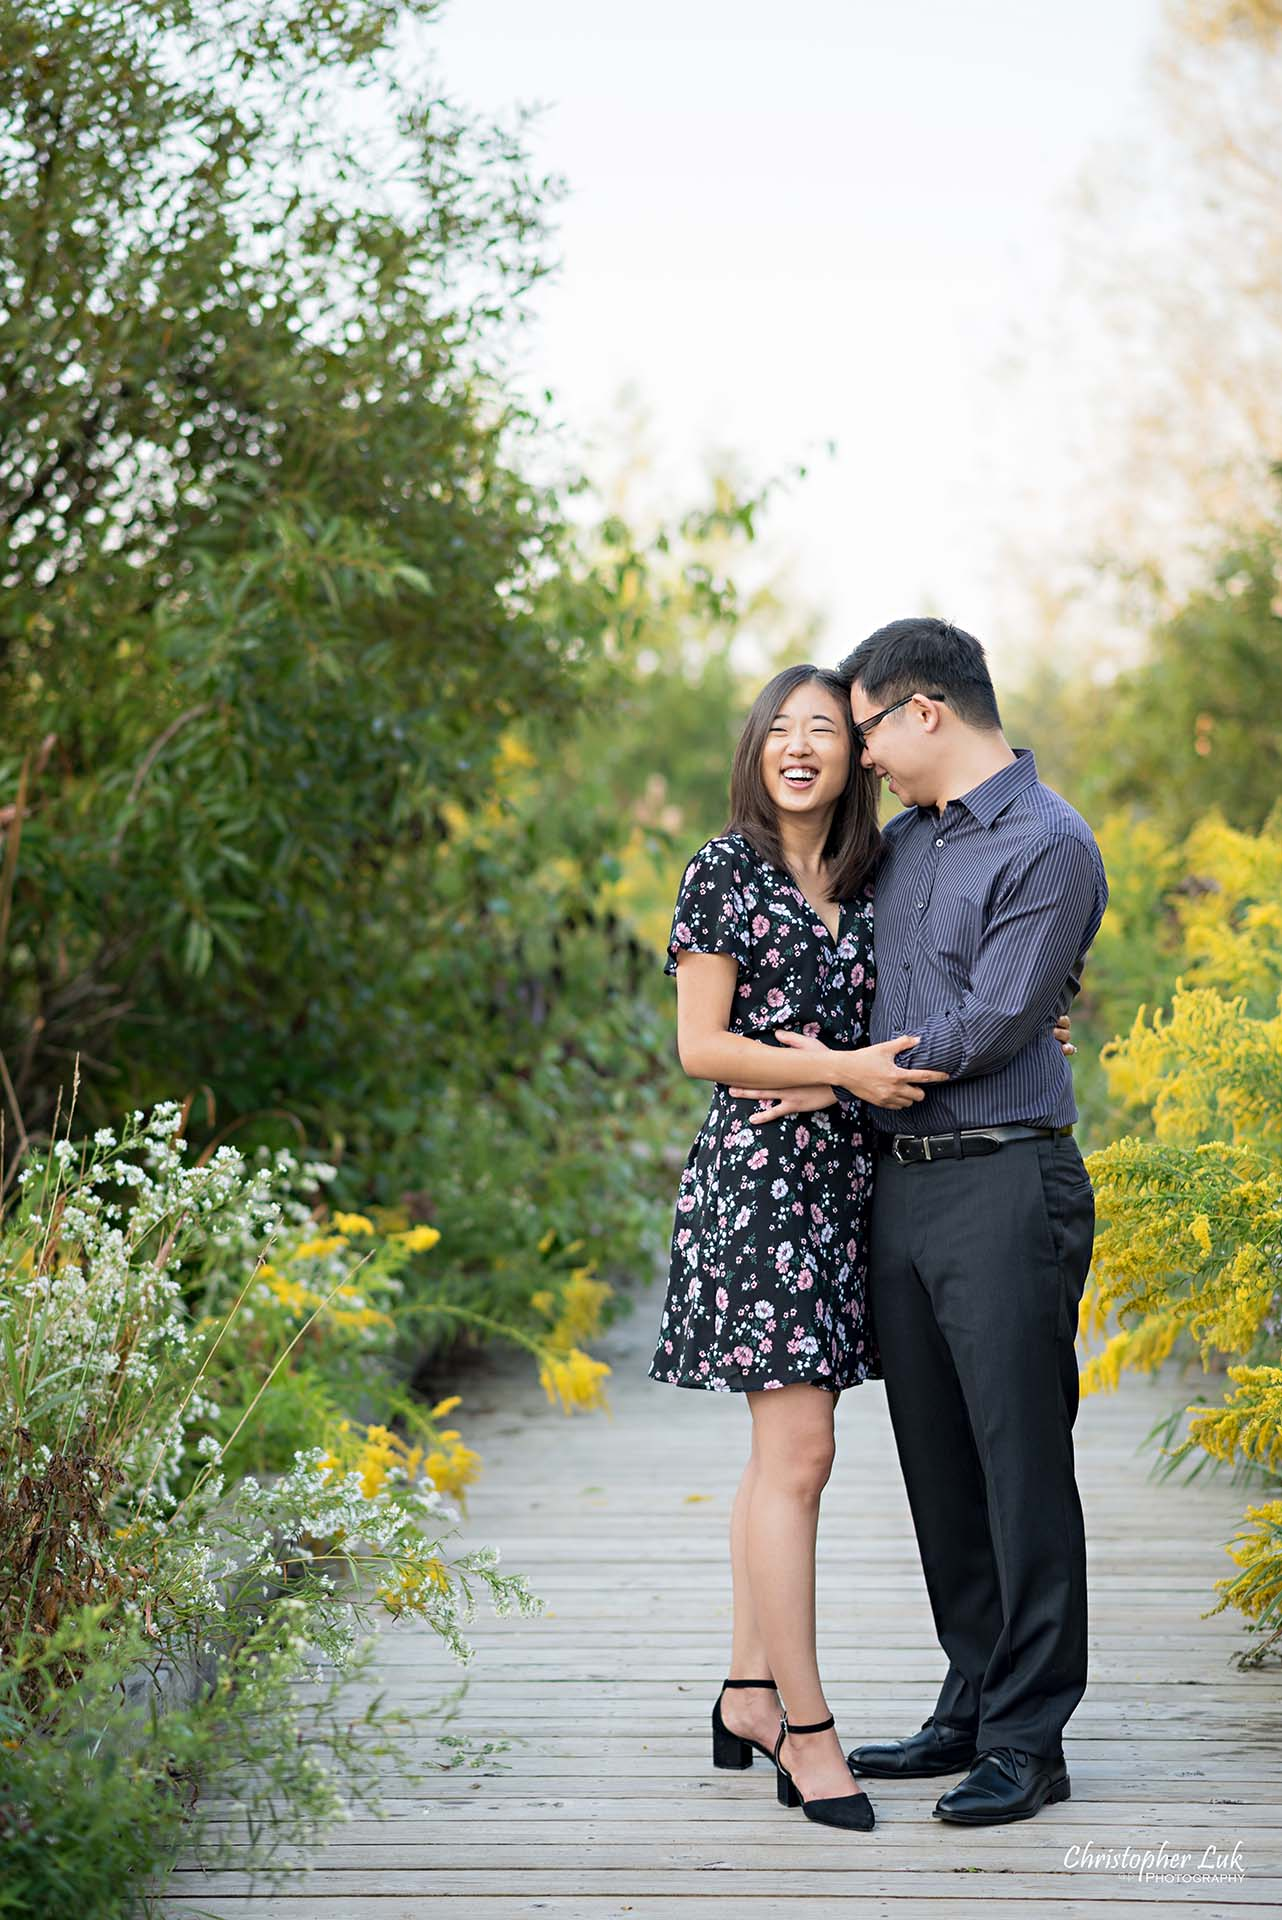 Christopher Luk Toronto Wedding Photographer - Richmond Hill Markham York Region Conservation Area Engagement PreWedding Chinese Korean - Natural Candid Photojournalistic Bride Groom Hug Boardwalk